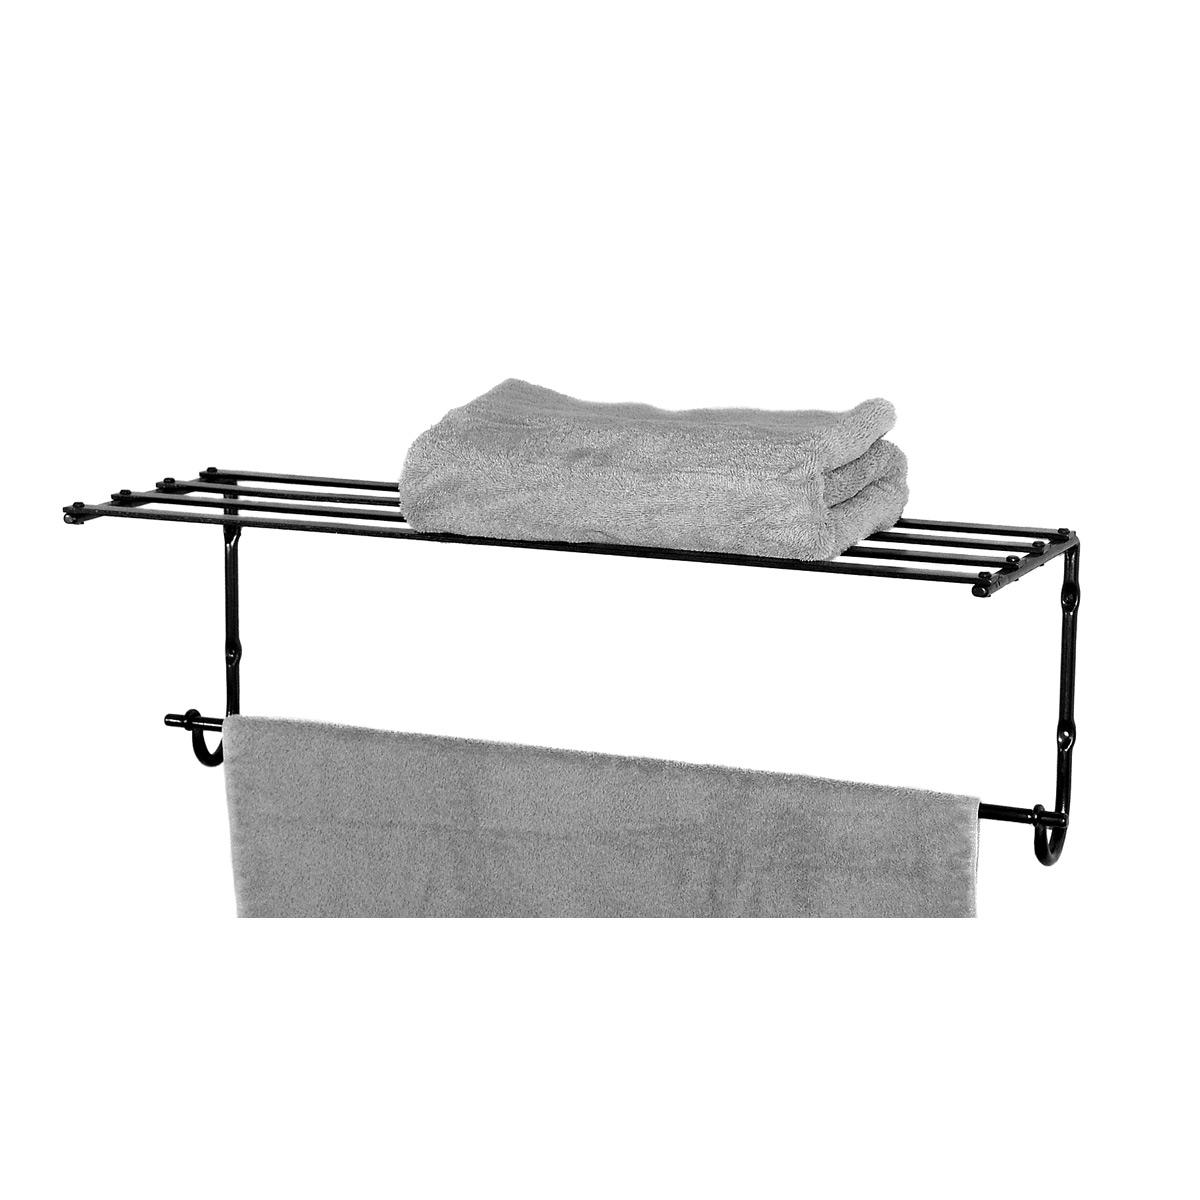 Towel Shelf with Towel Bar